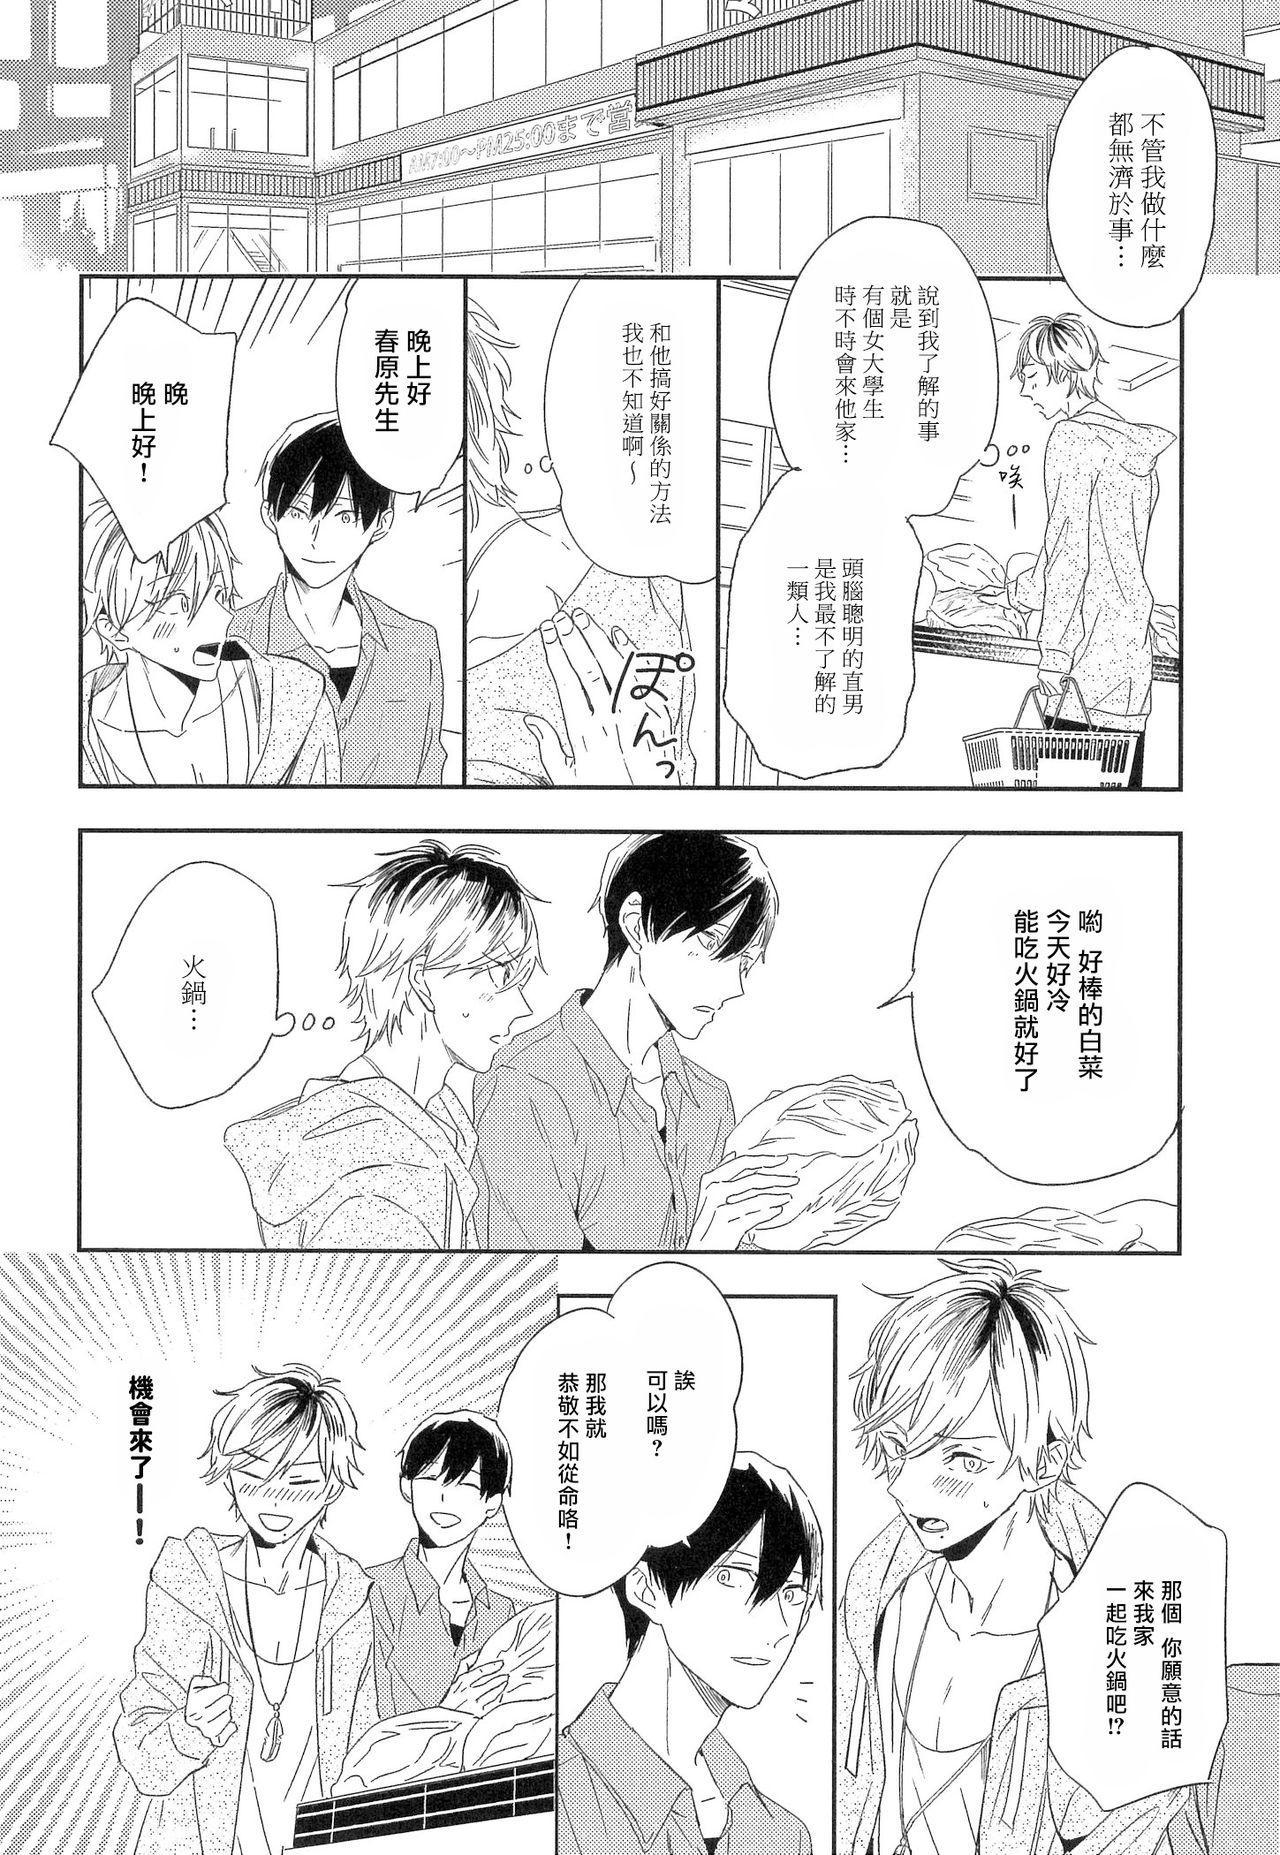 Itoshi no Centimeter   爱情的长度 Ch. 1 12